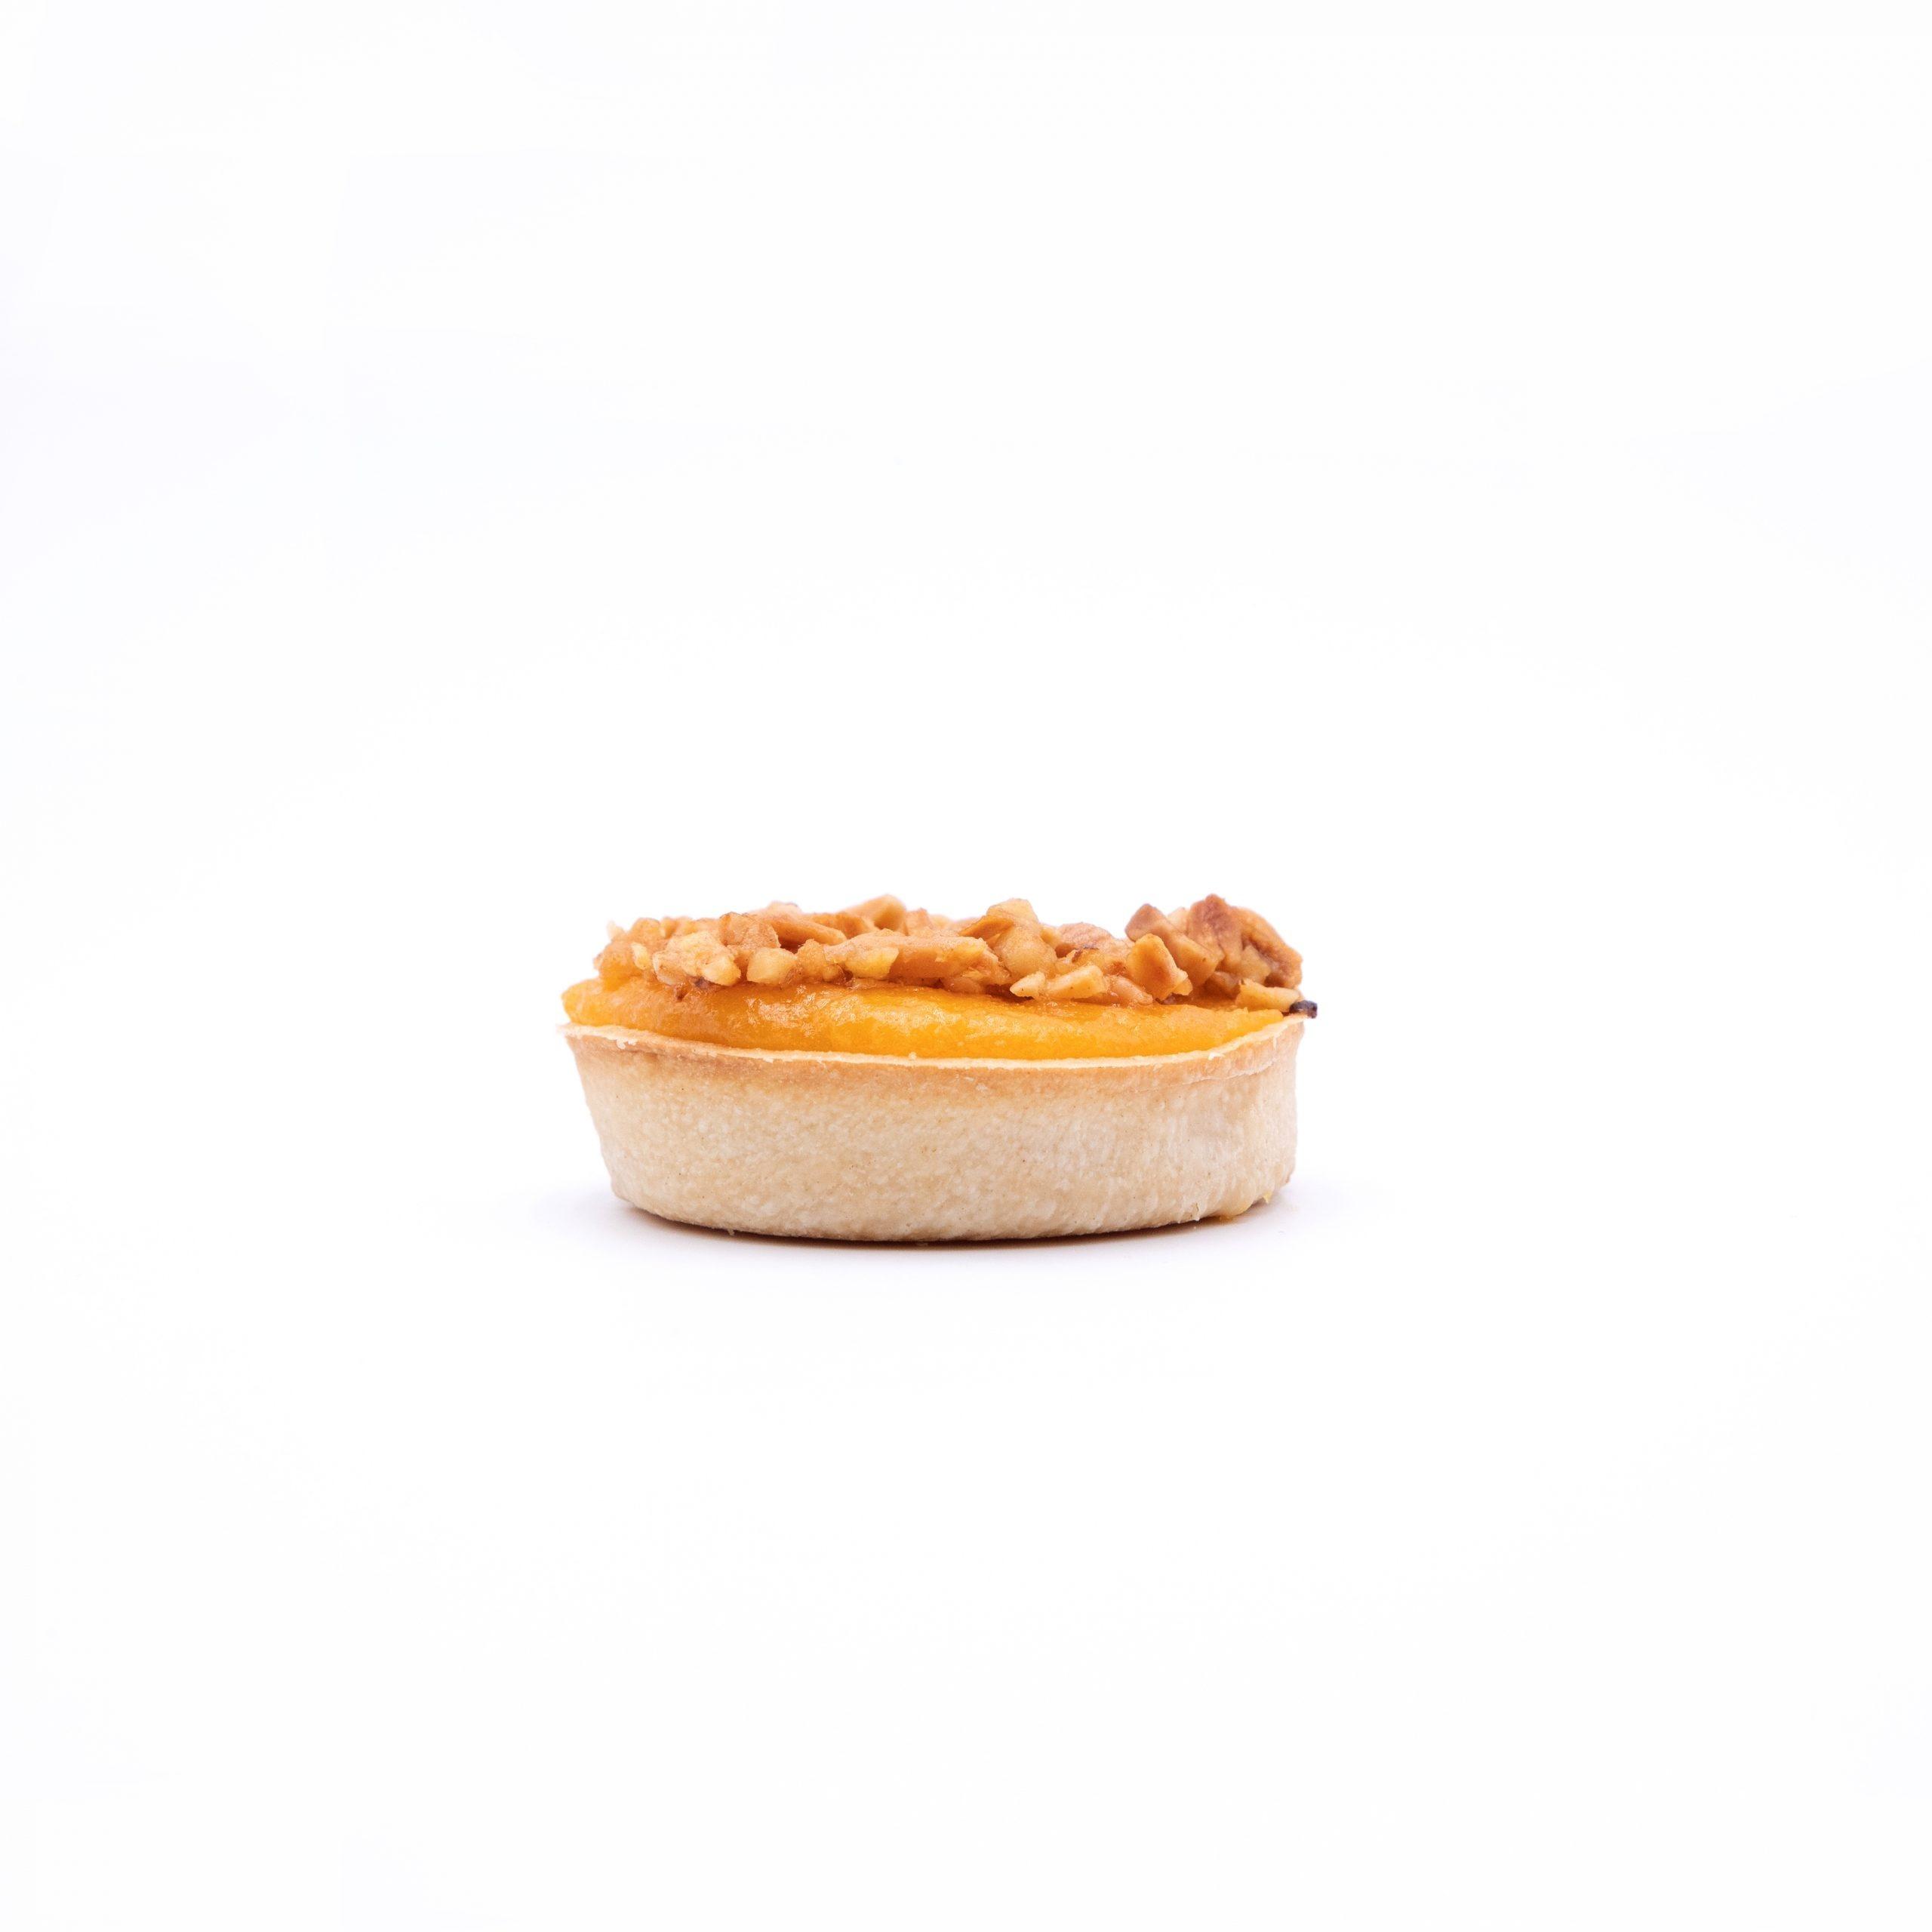 1-tiara-d-ines-atelier-do-doce-alfeizerao-pastelaria-doces-conventuais